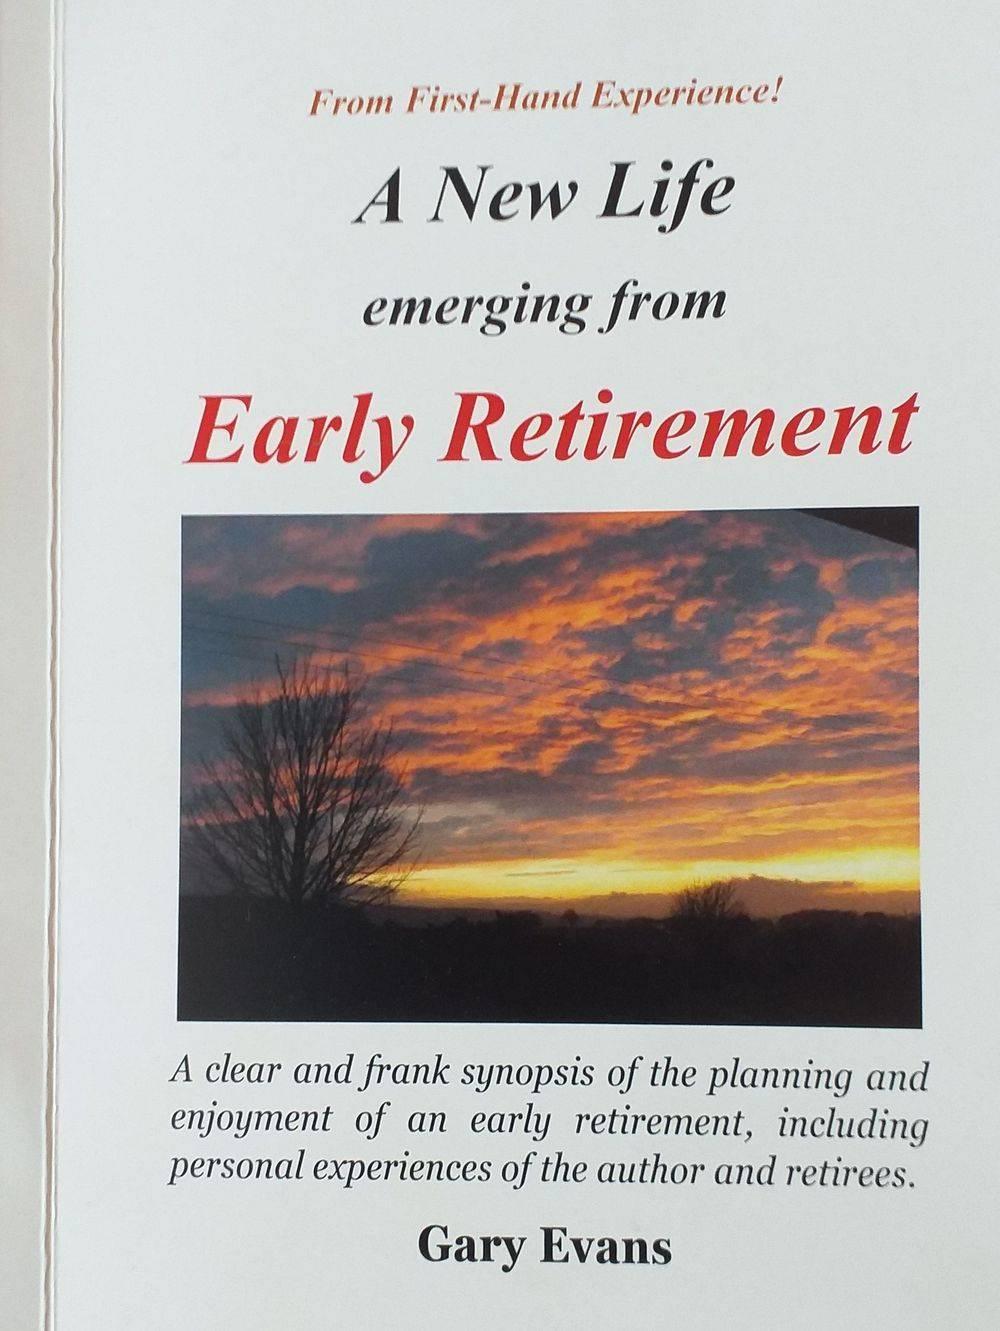 retirement planning, Gary Evans, self-help books